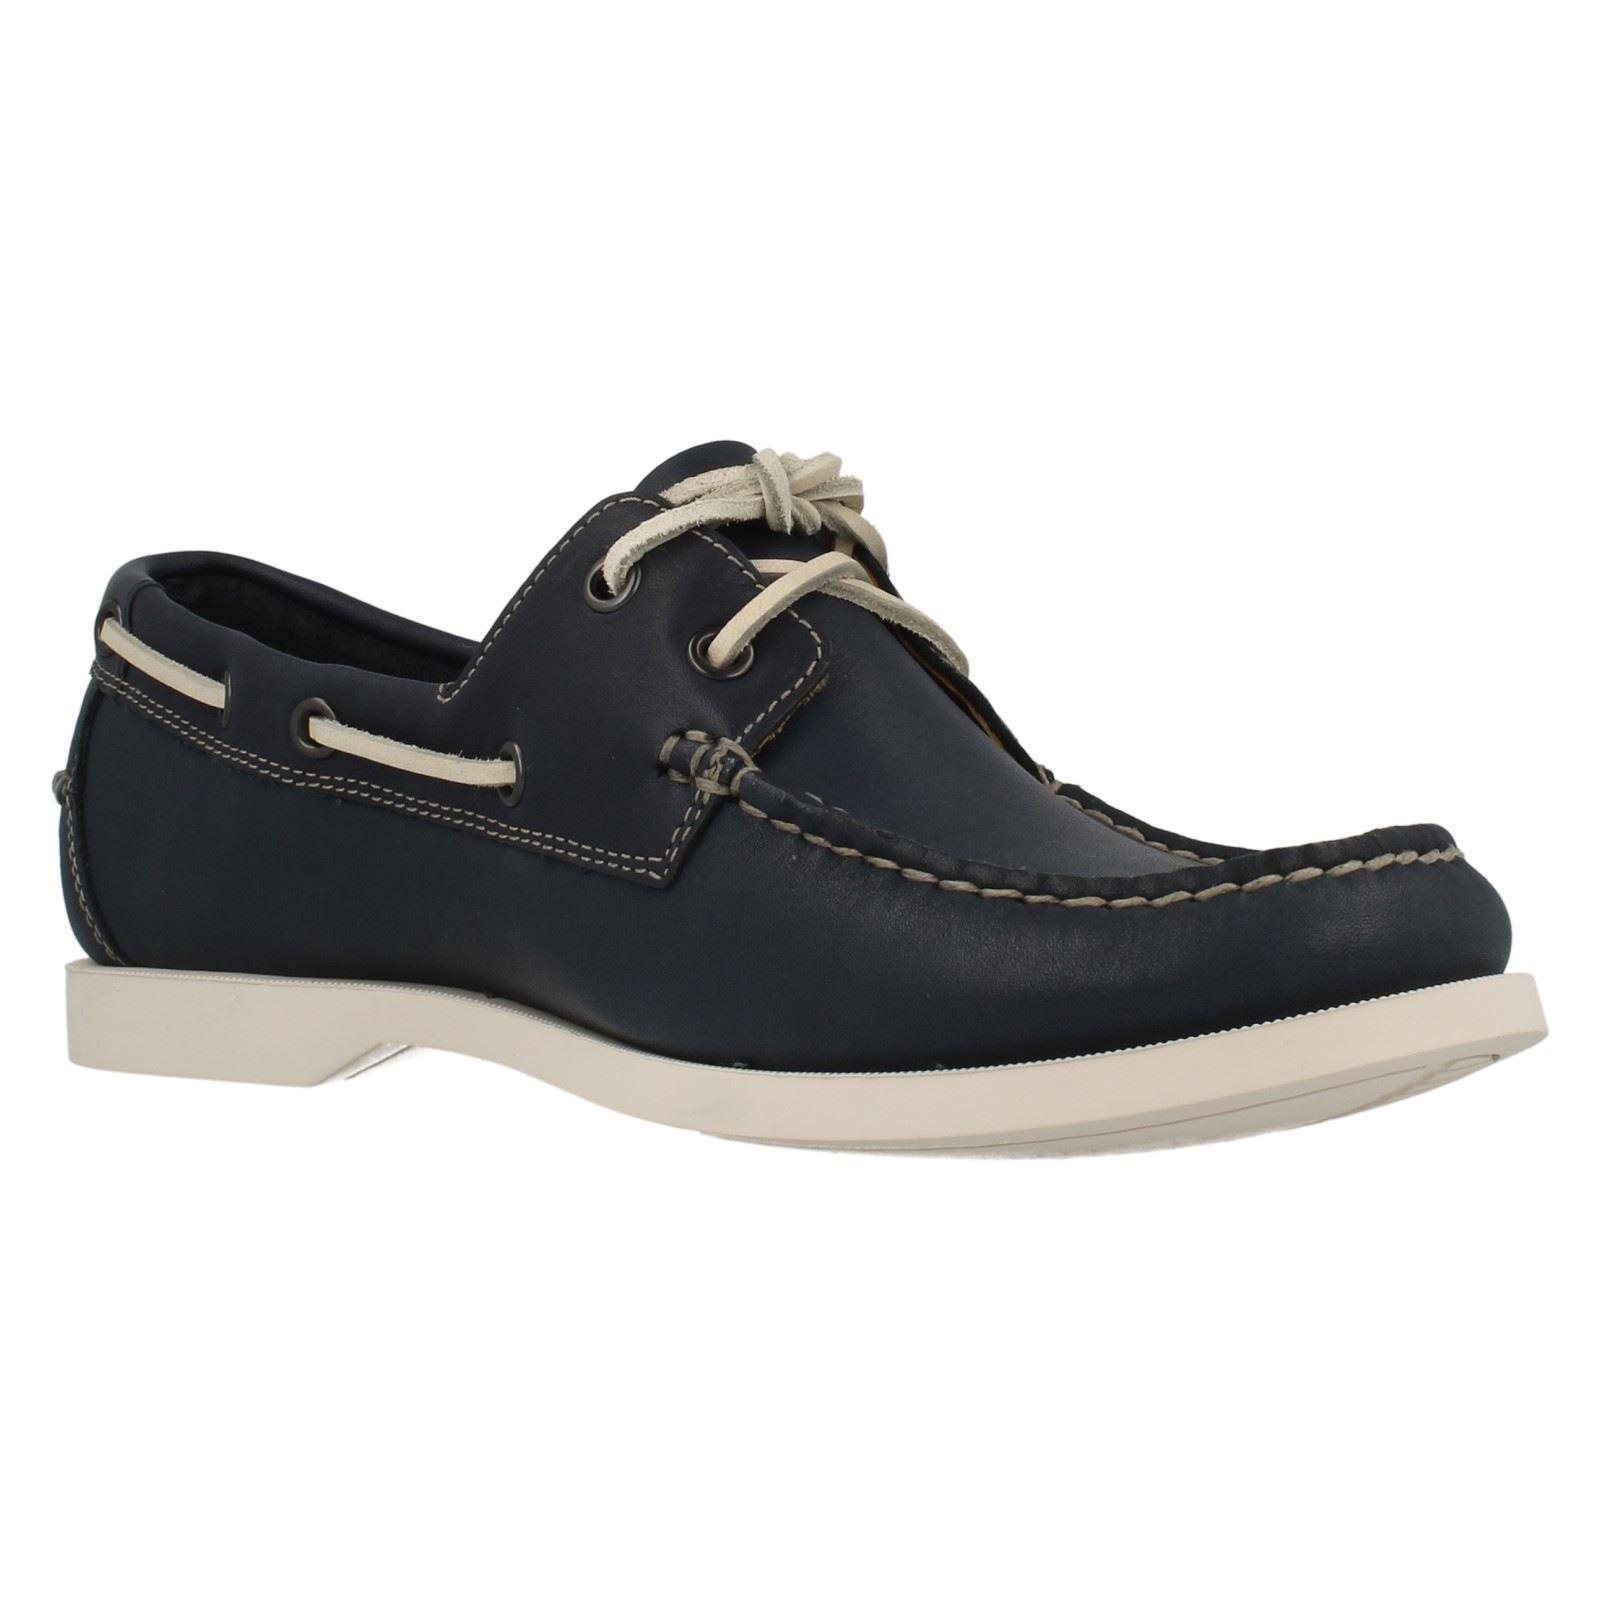 Hombre Clarks Deck Deck Deck Style Zapatos Nautic Bay d97c0b